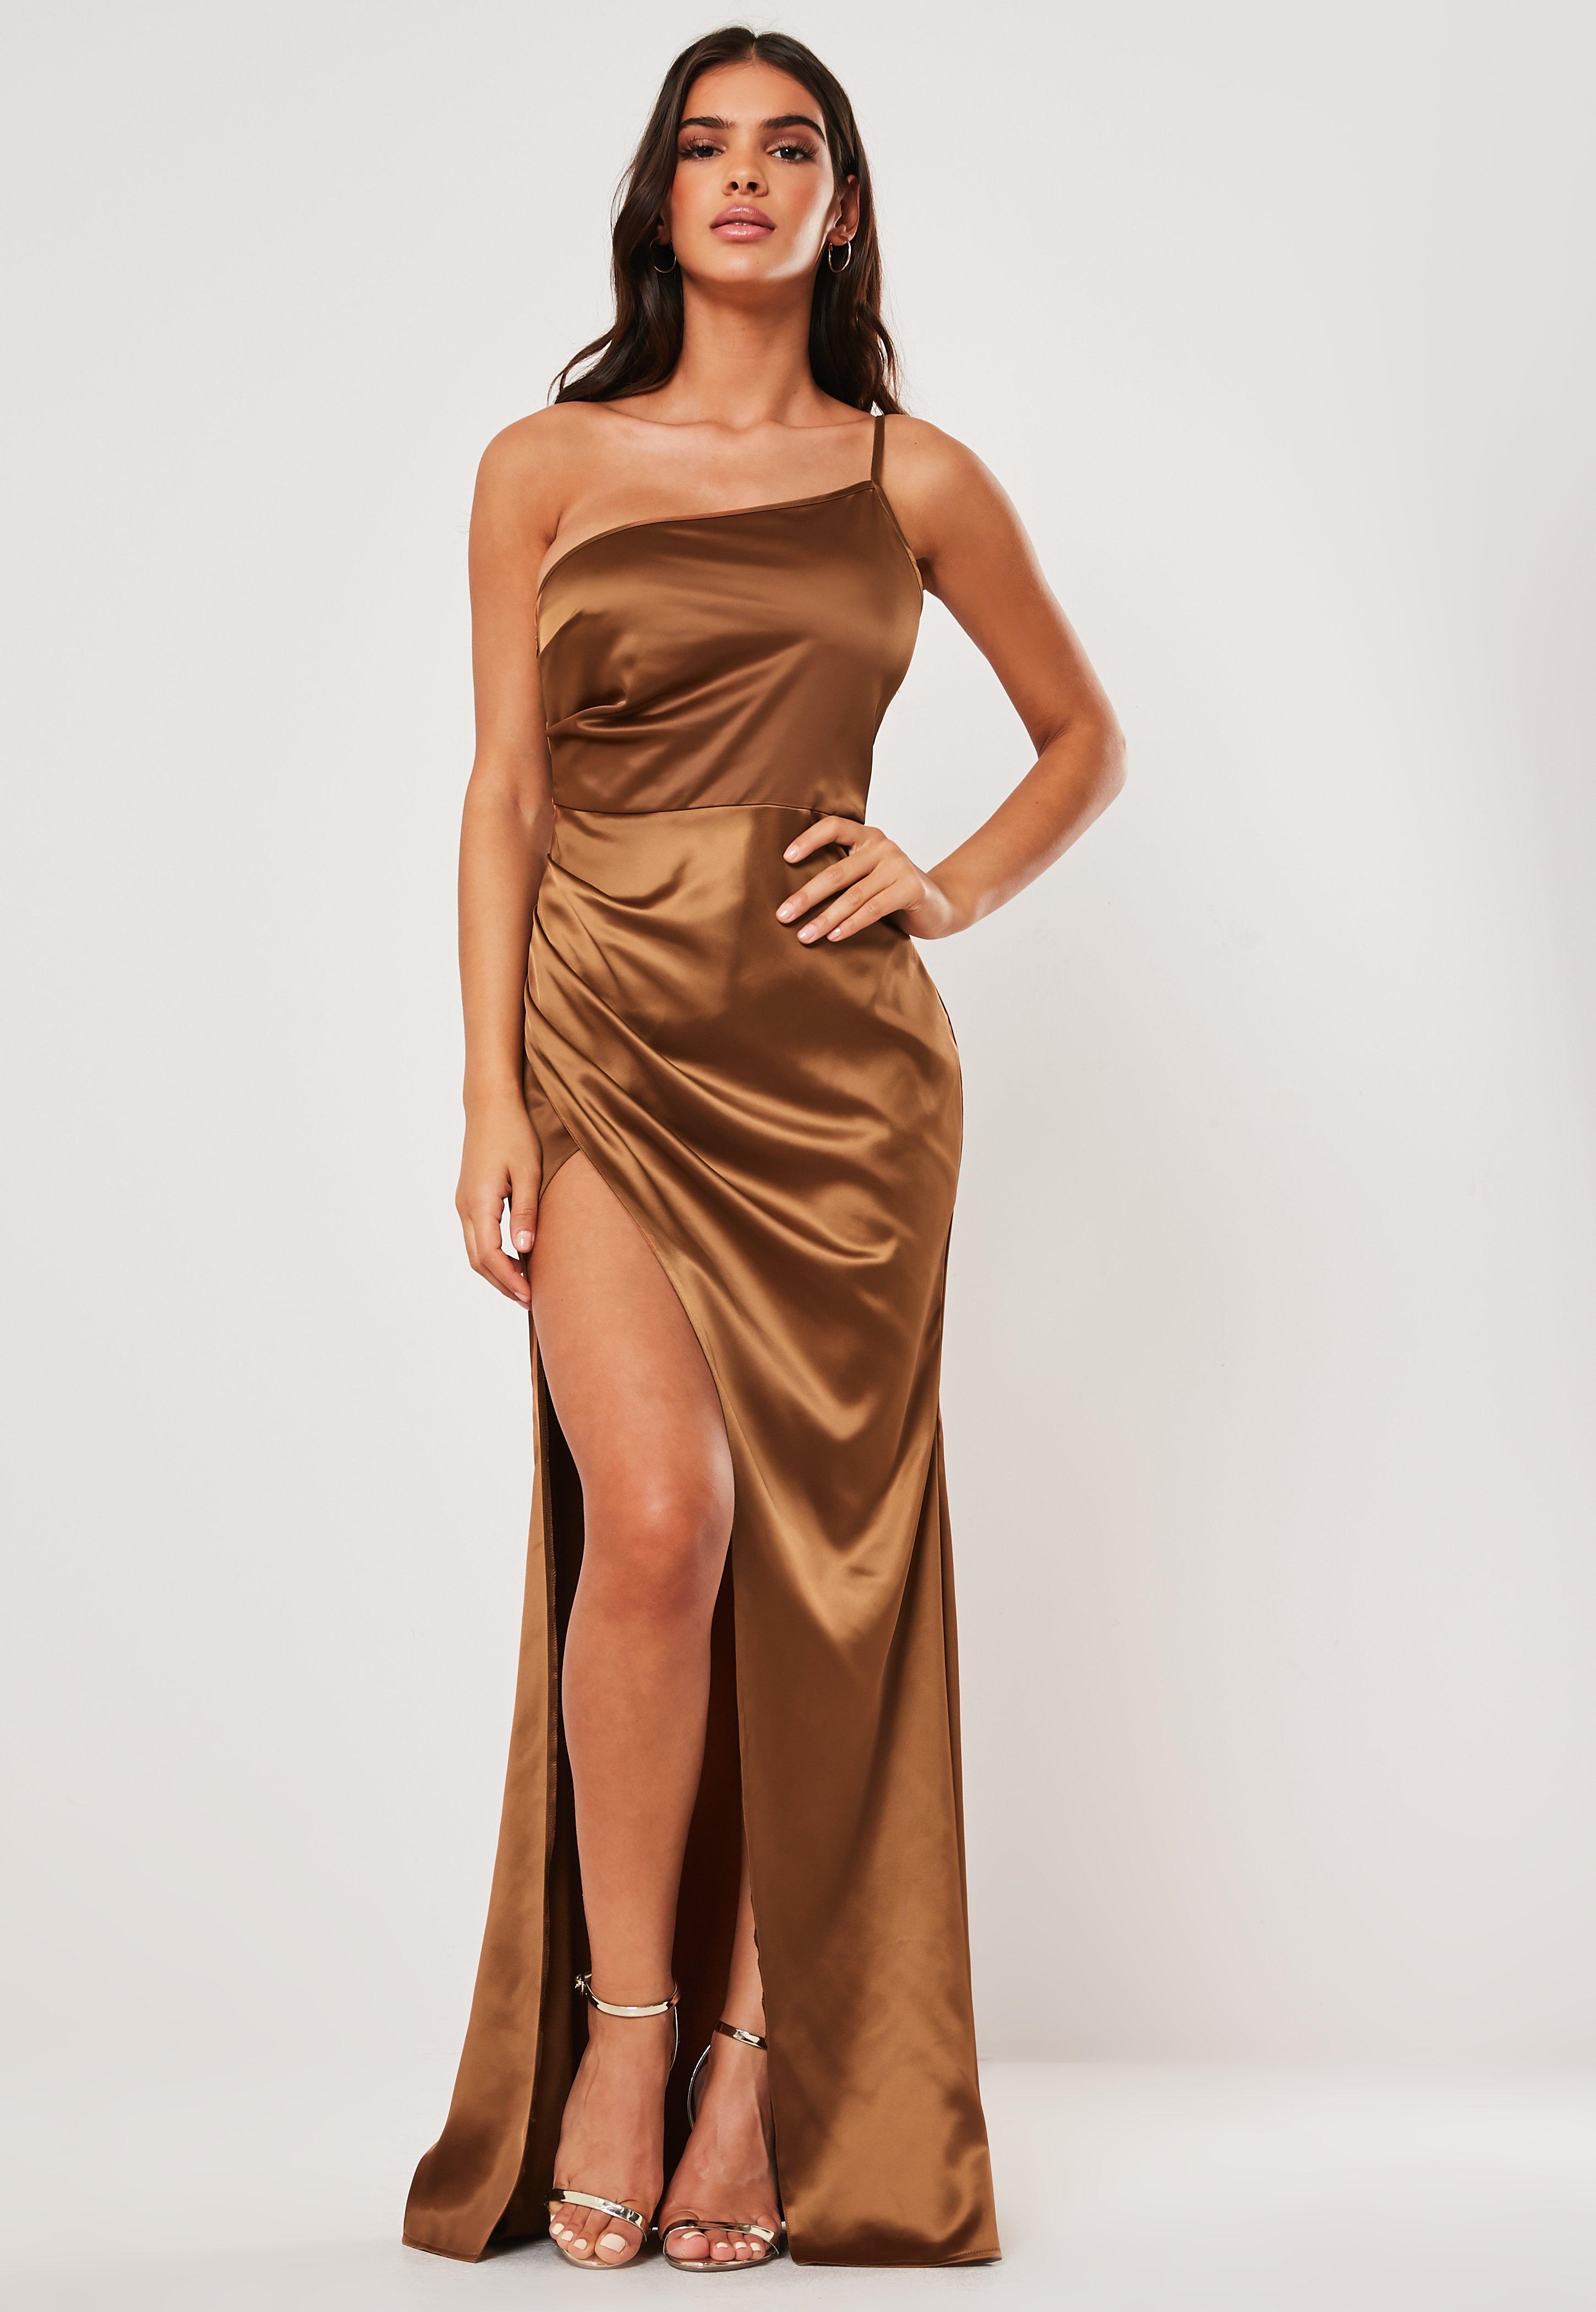 Tan Satin One Shoulder Maxi Dress